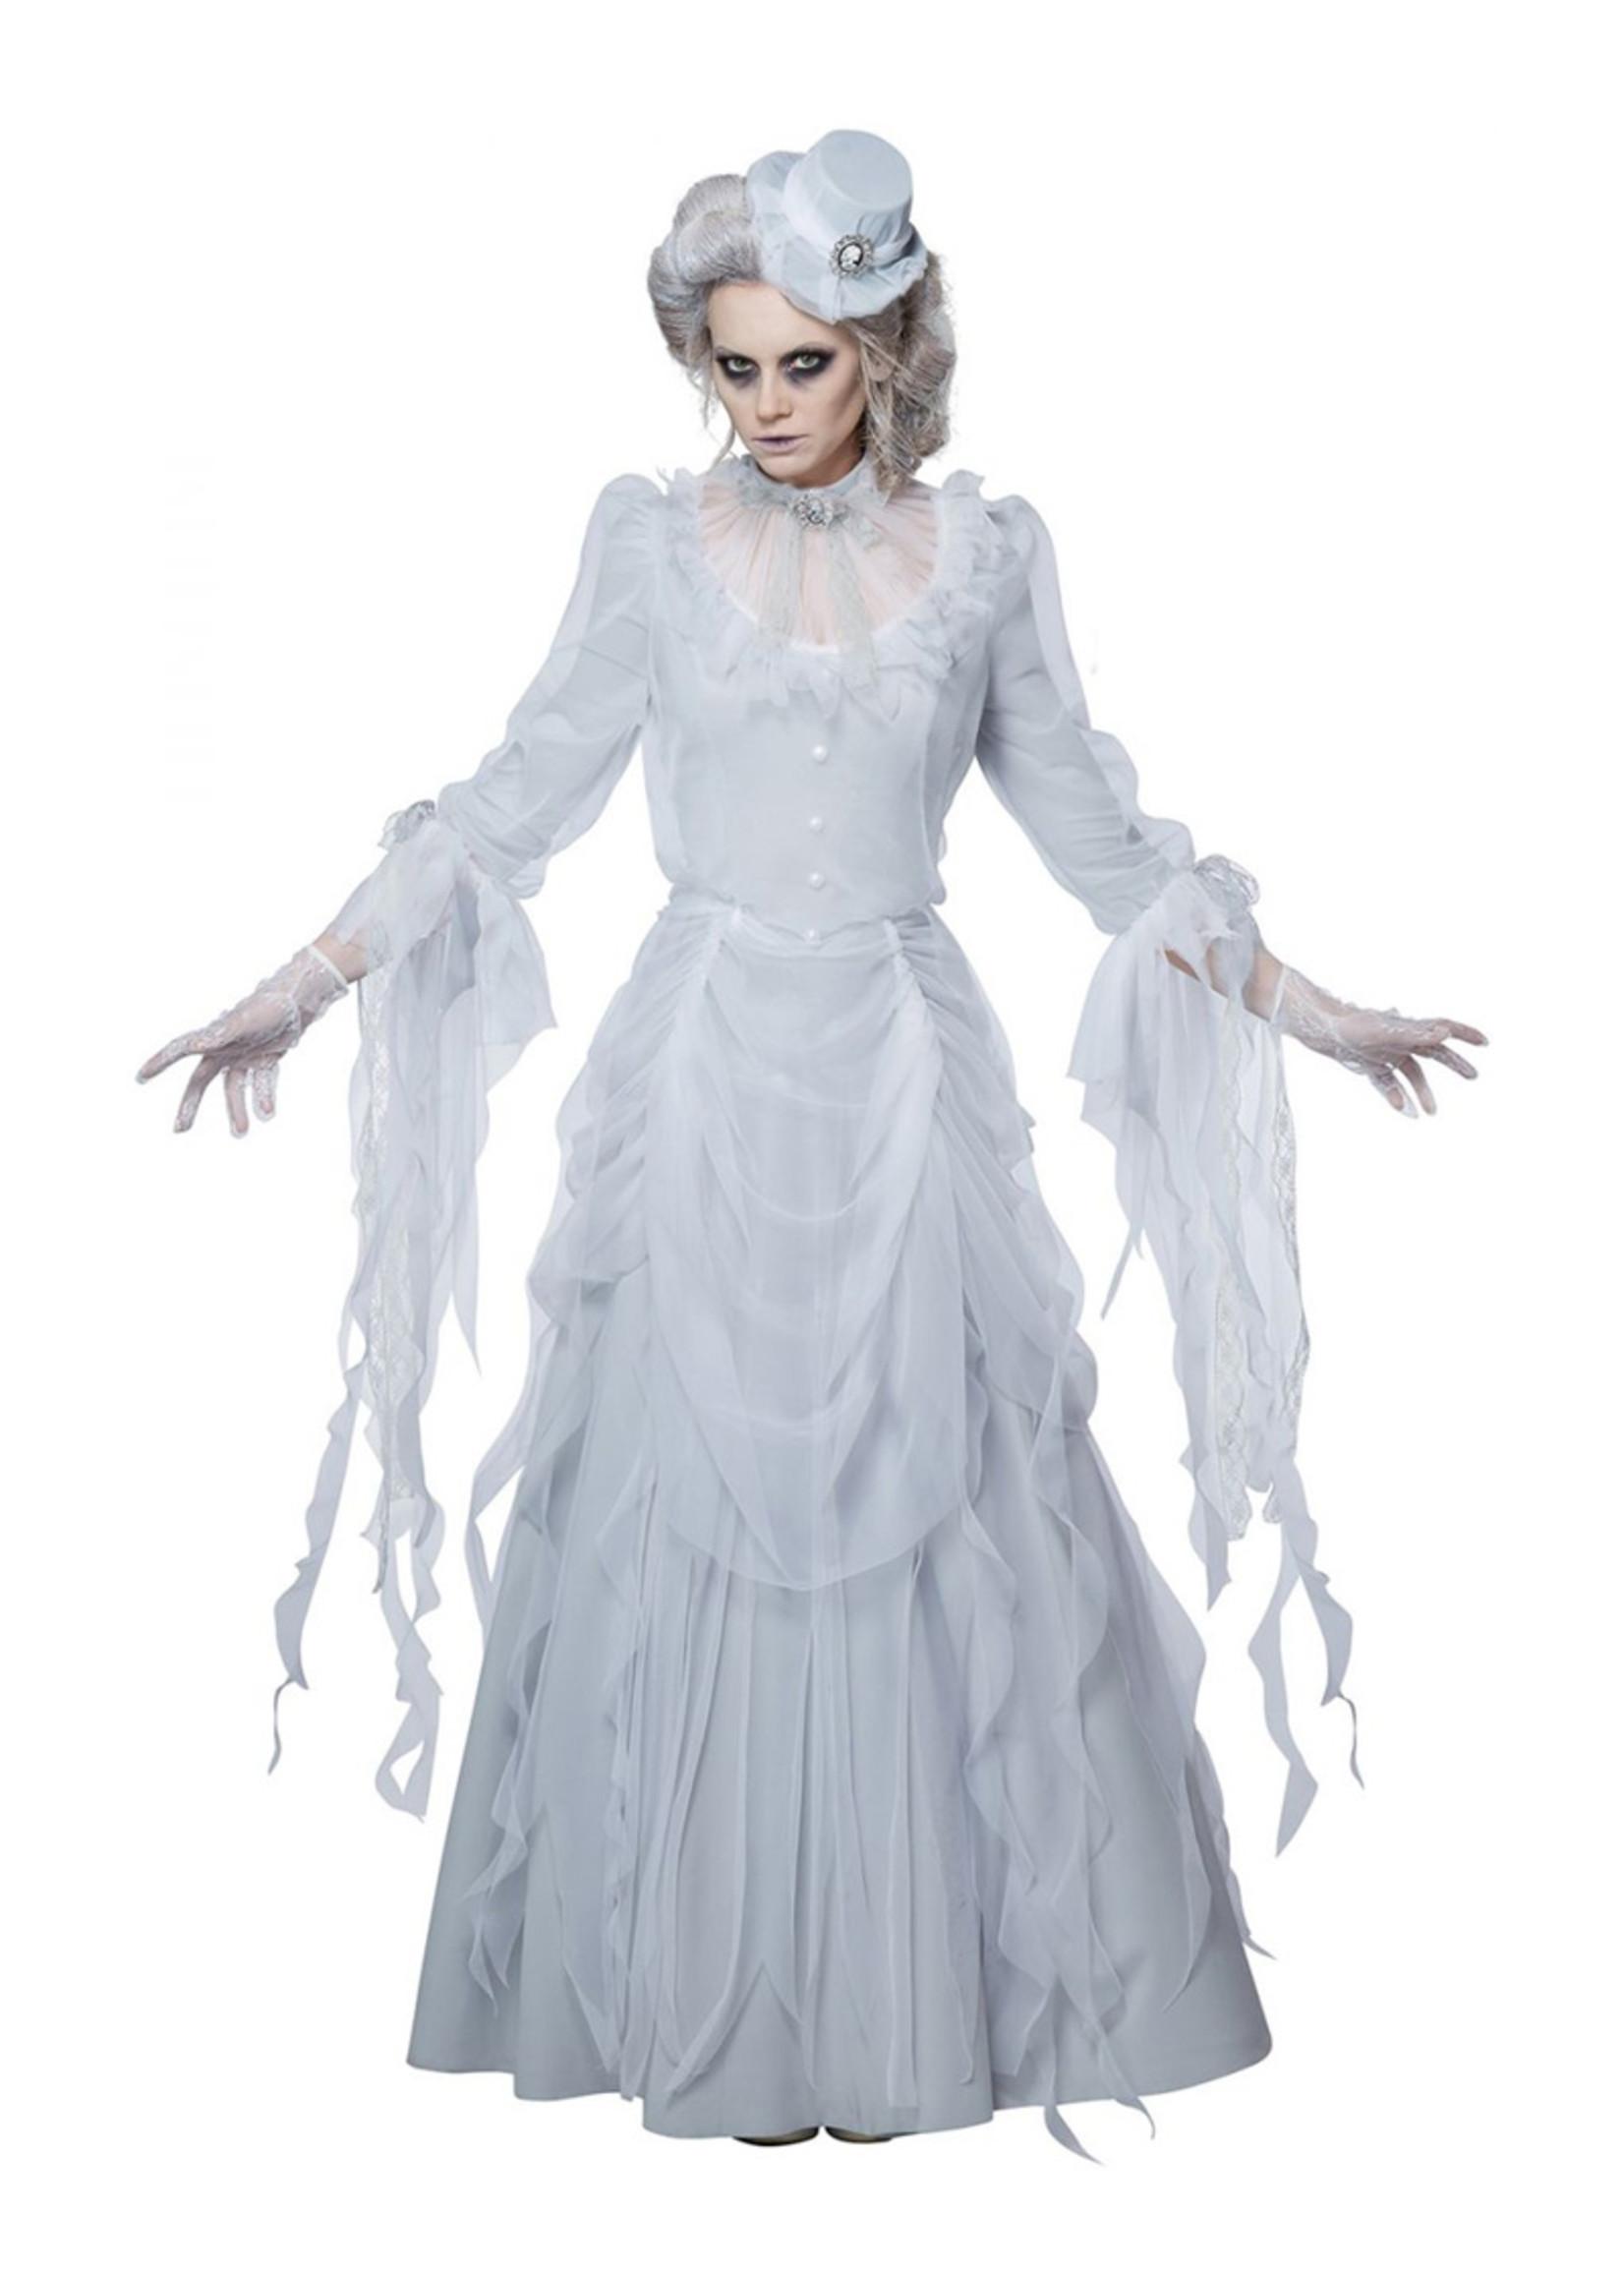 Haunting Lady Costume - Women's